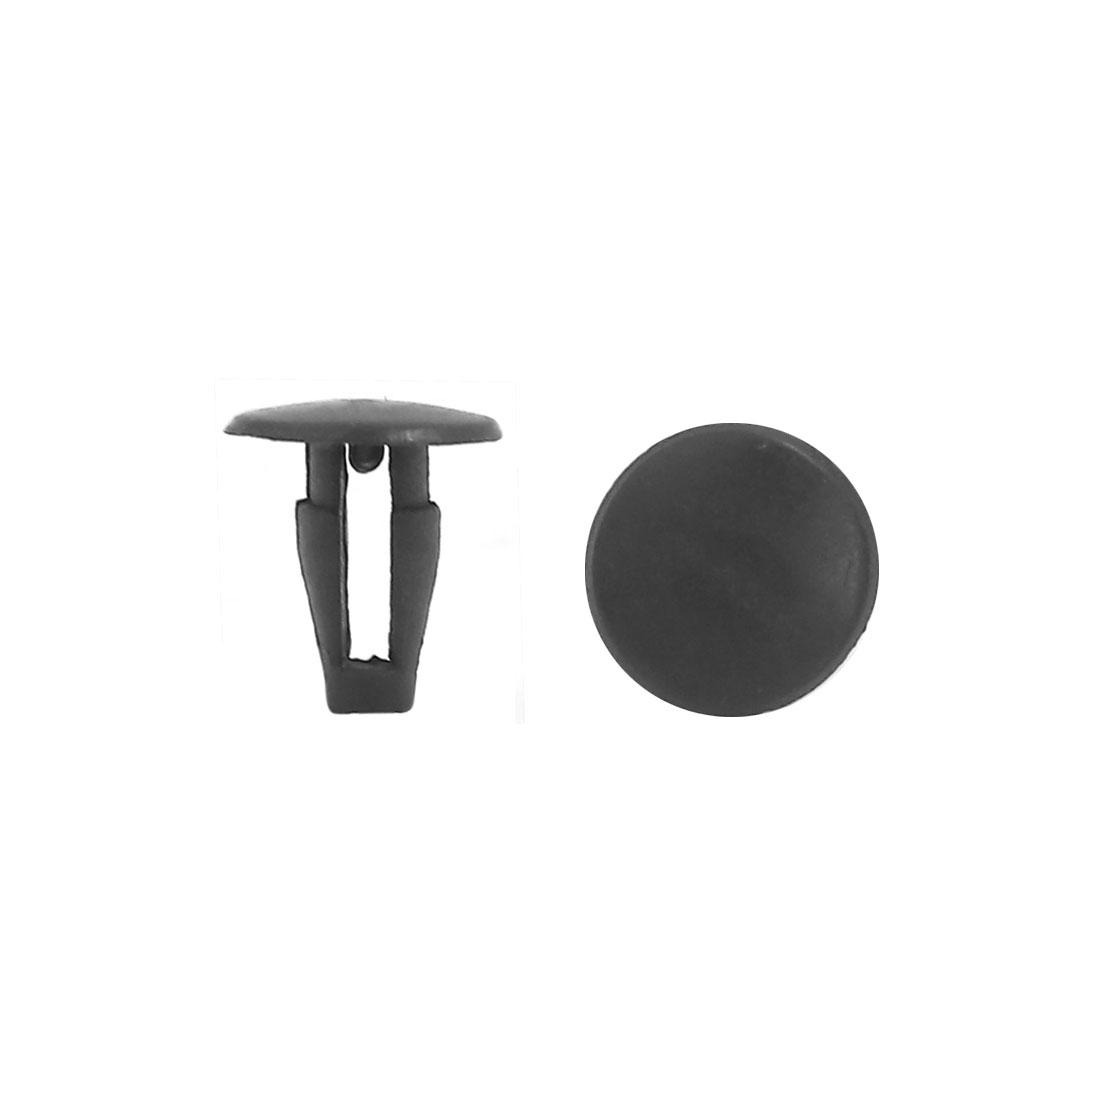 100 Pcs 7mm Hole Dia Black Plastic Rivets Fastener Push Clips for Automobile